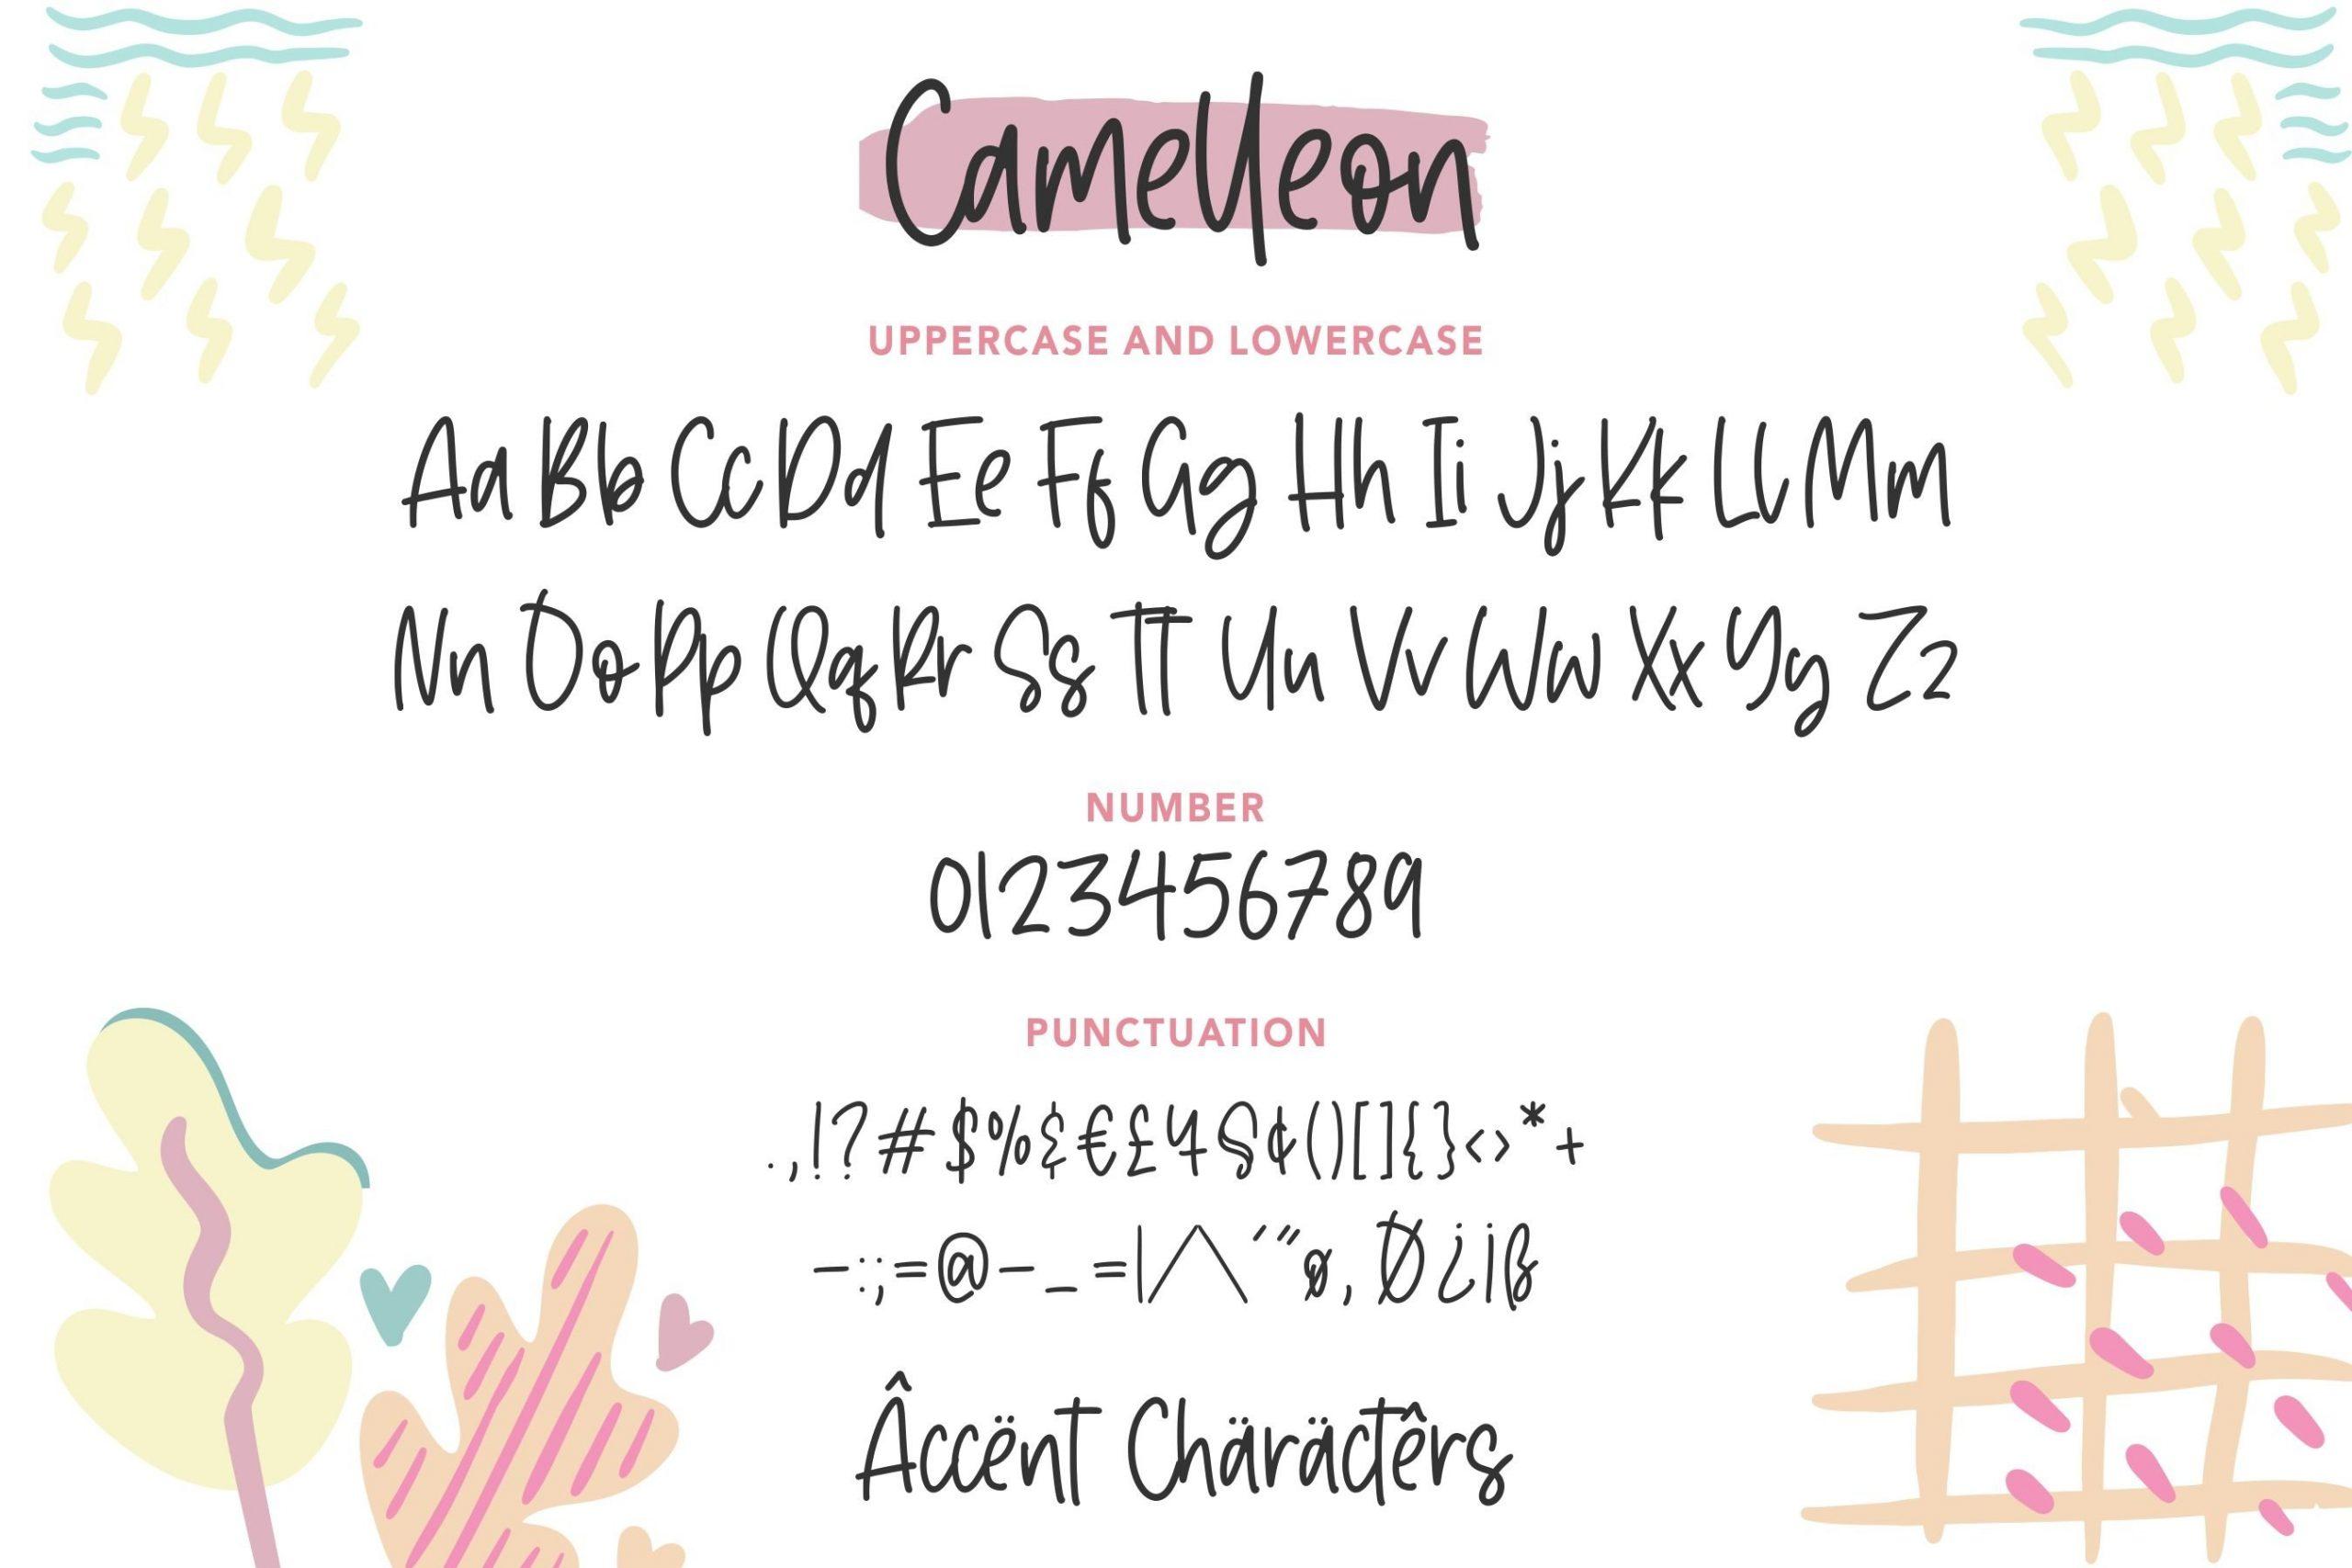 Camelleon6